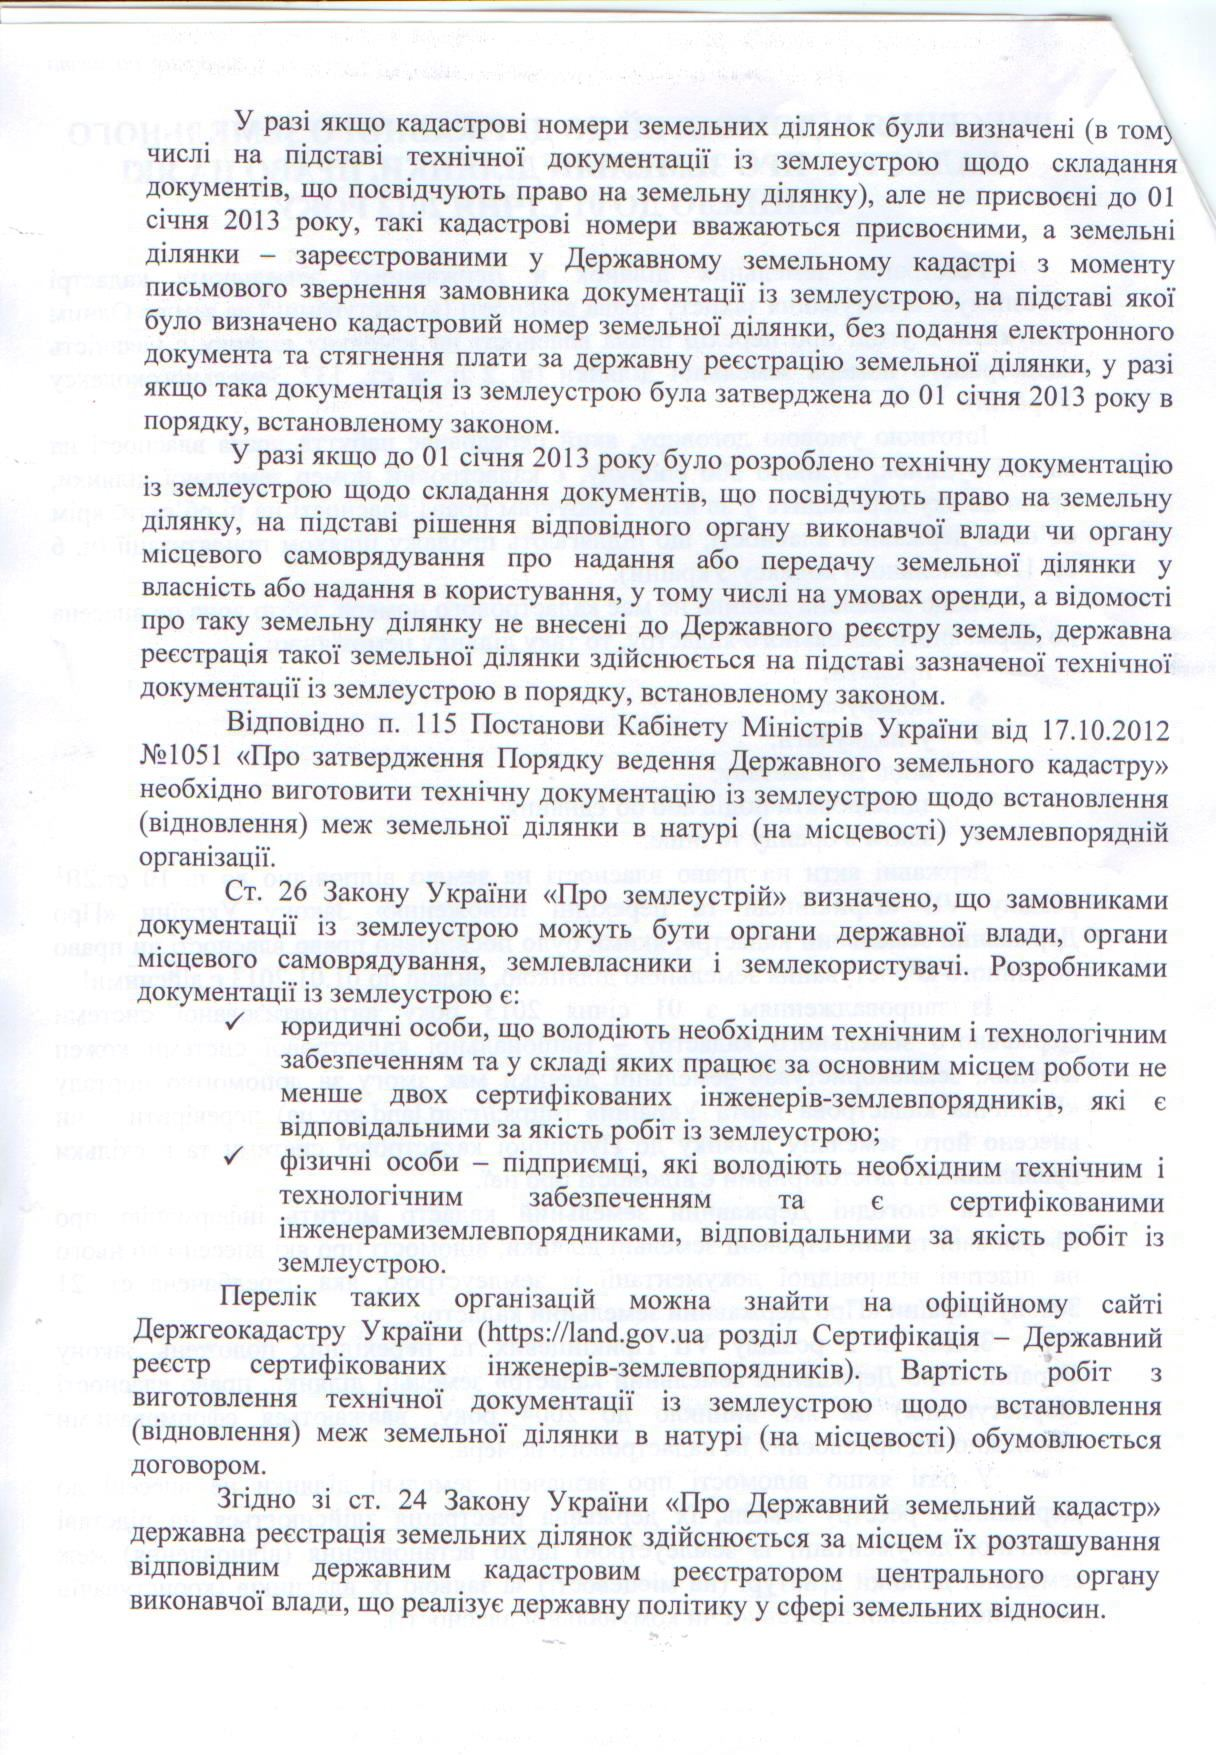 2021-04-05_09-32-26_winscan_to_pdf.